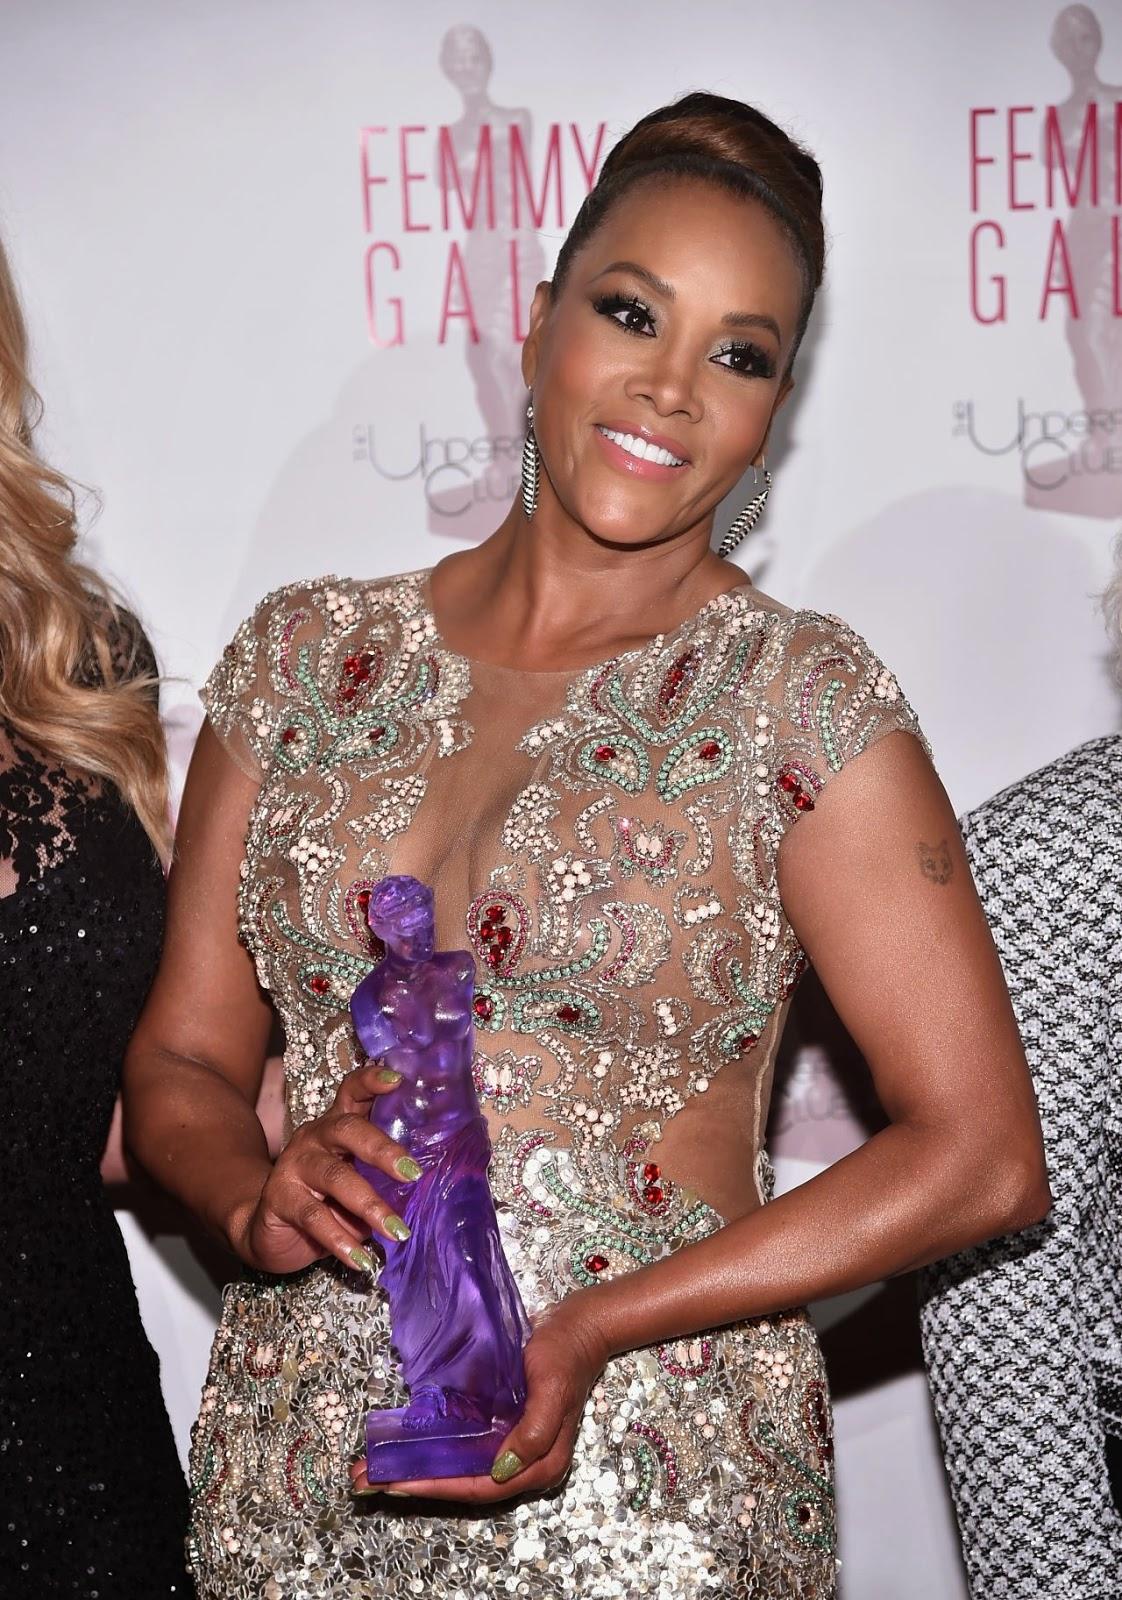 Vivica A. Fox – 2015 FEMMY Awards Gala in New York City